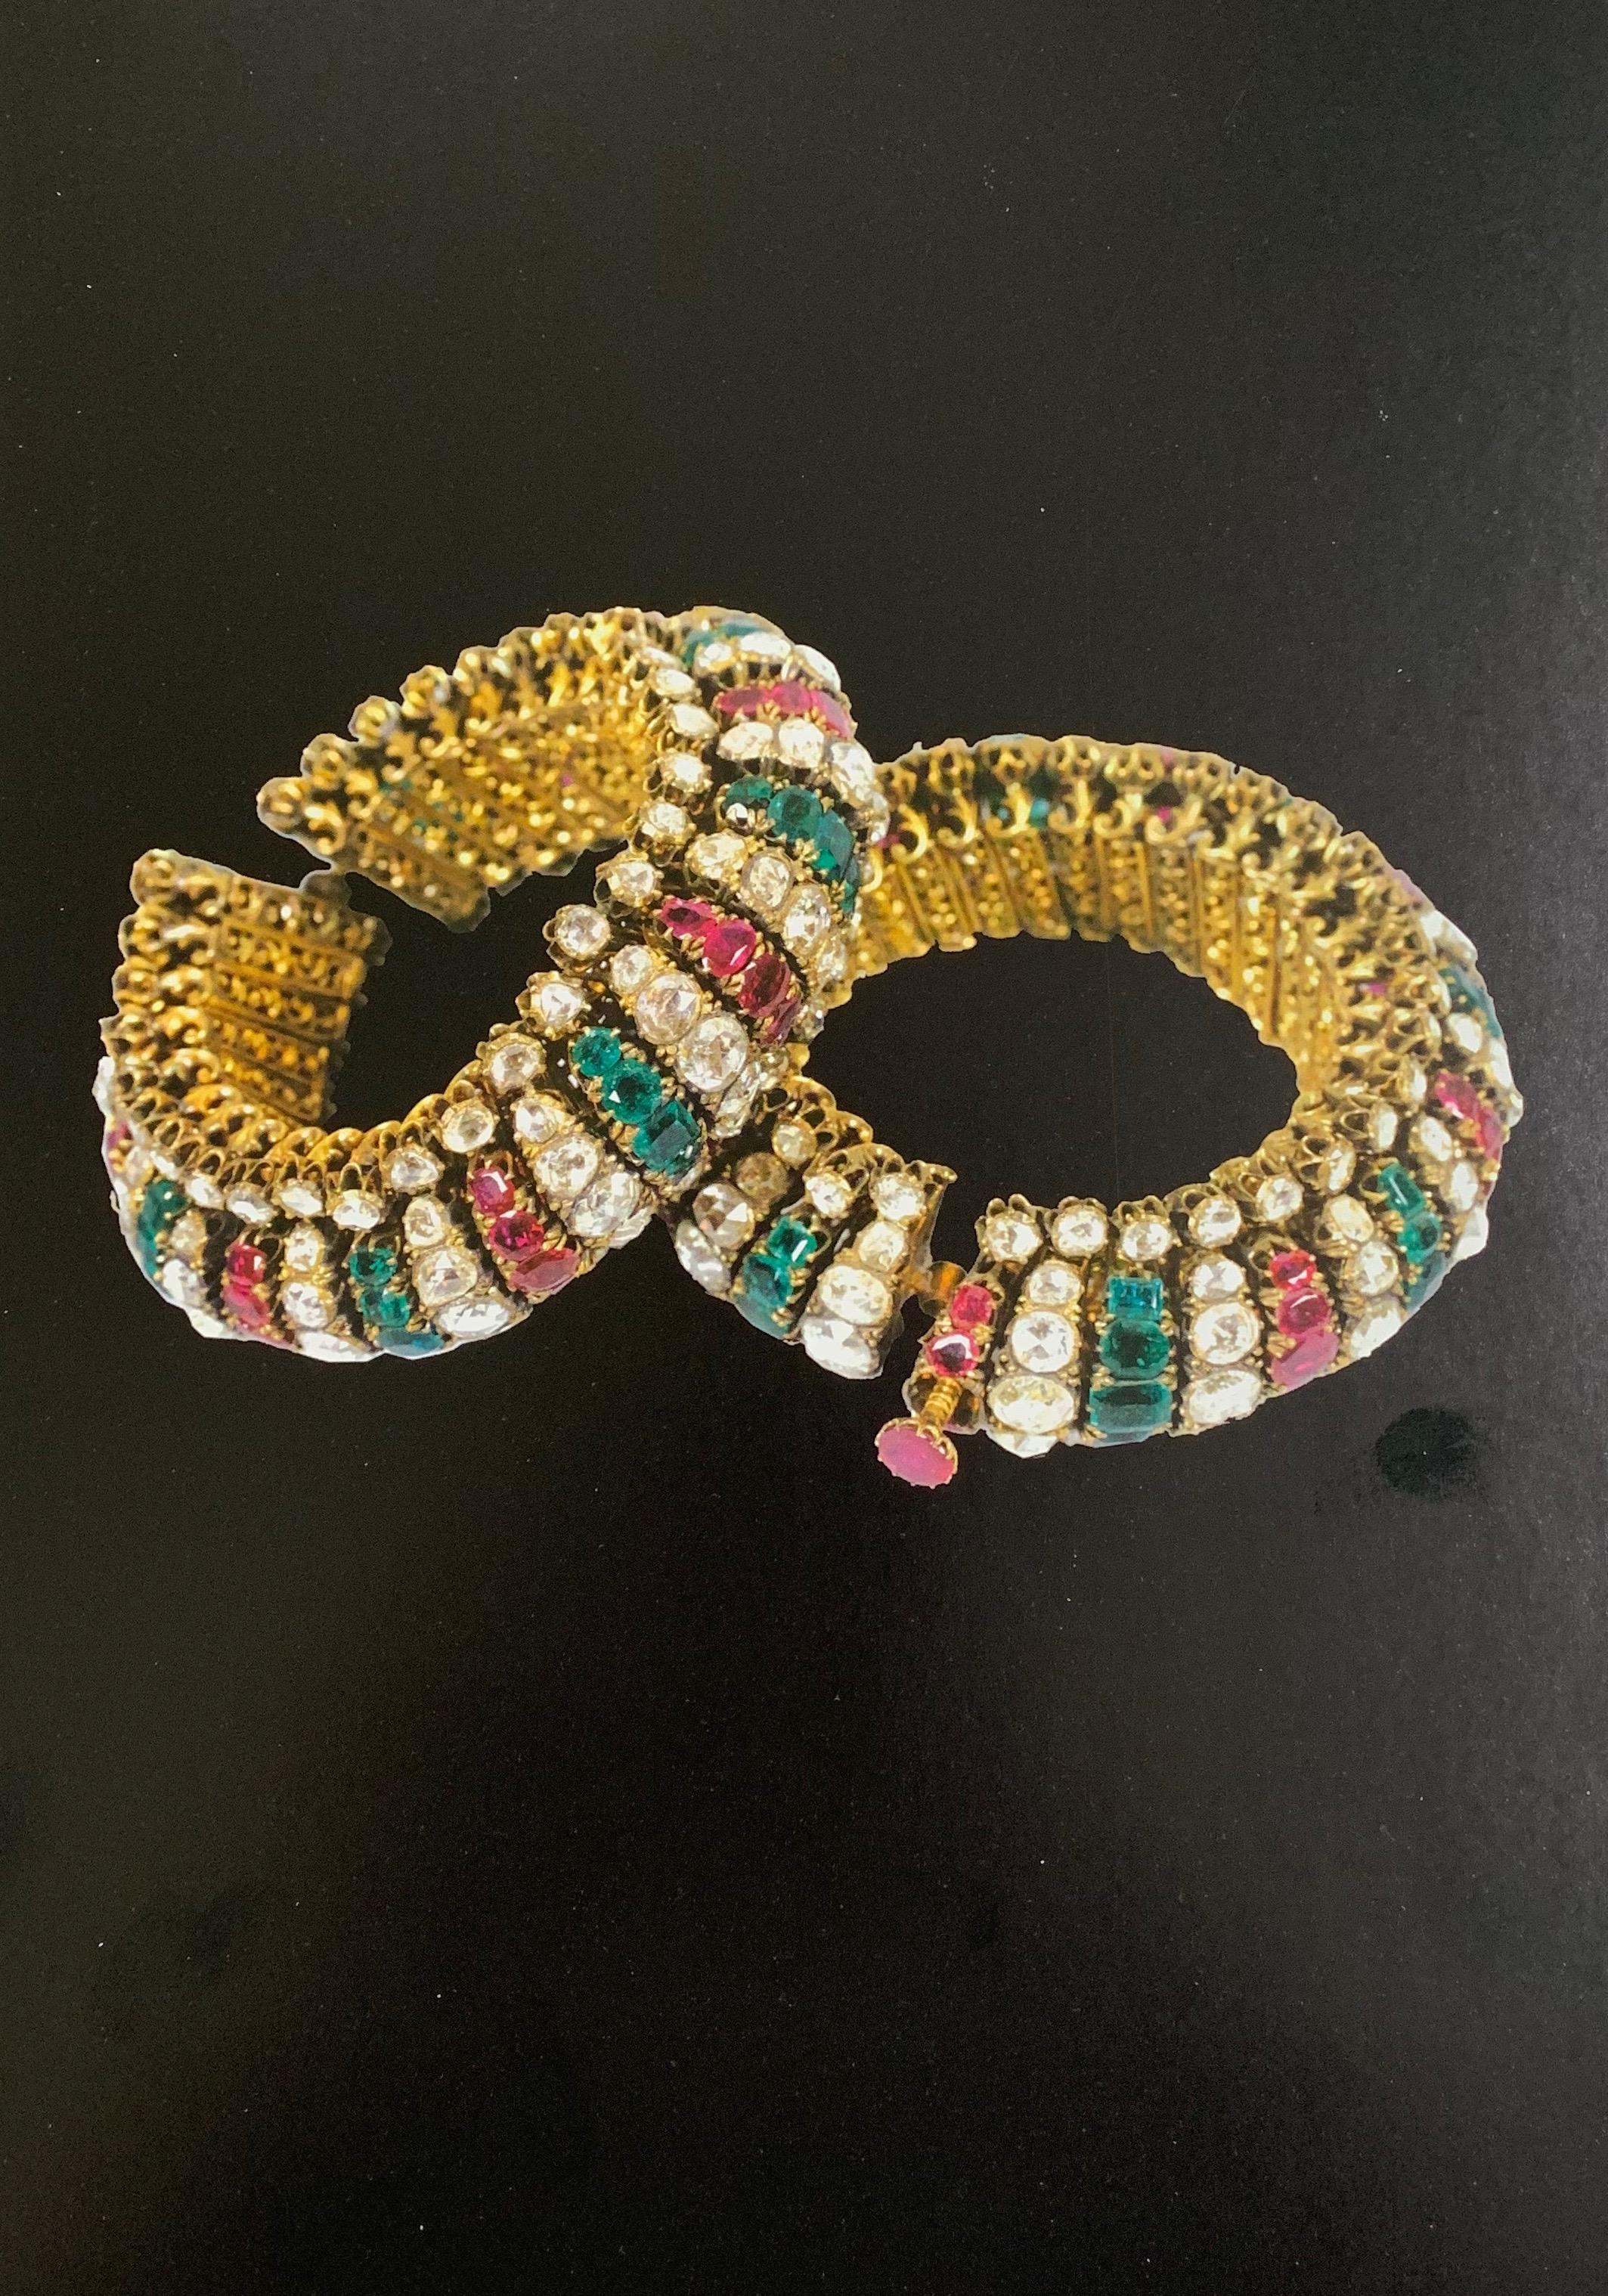 Tora Paon Jaravi Almas Yakhot Zamarrud -- Gold anklets set with diamonds, rubies and emeralds